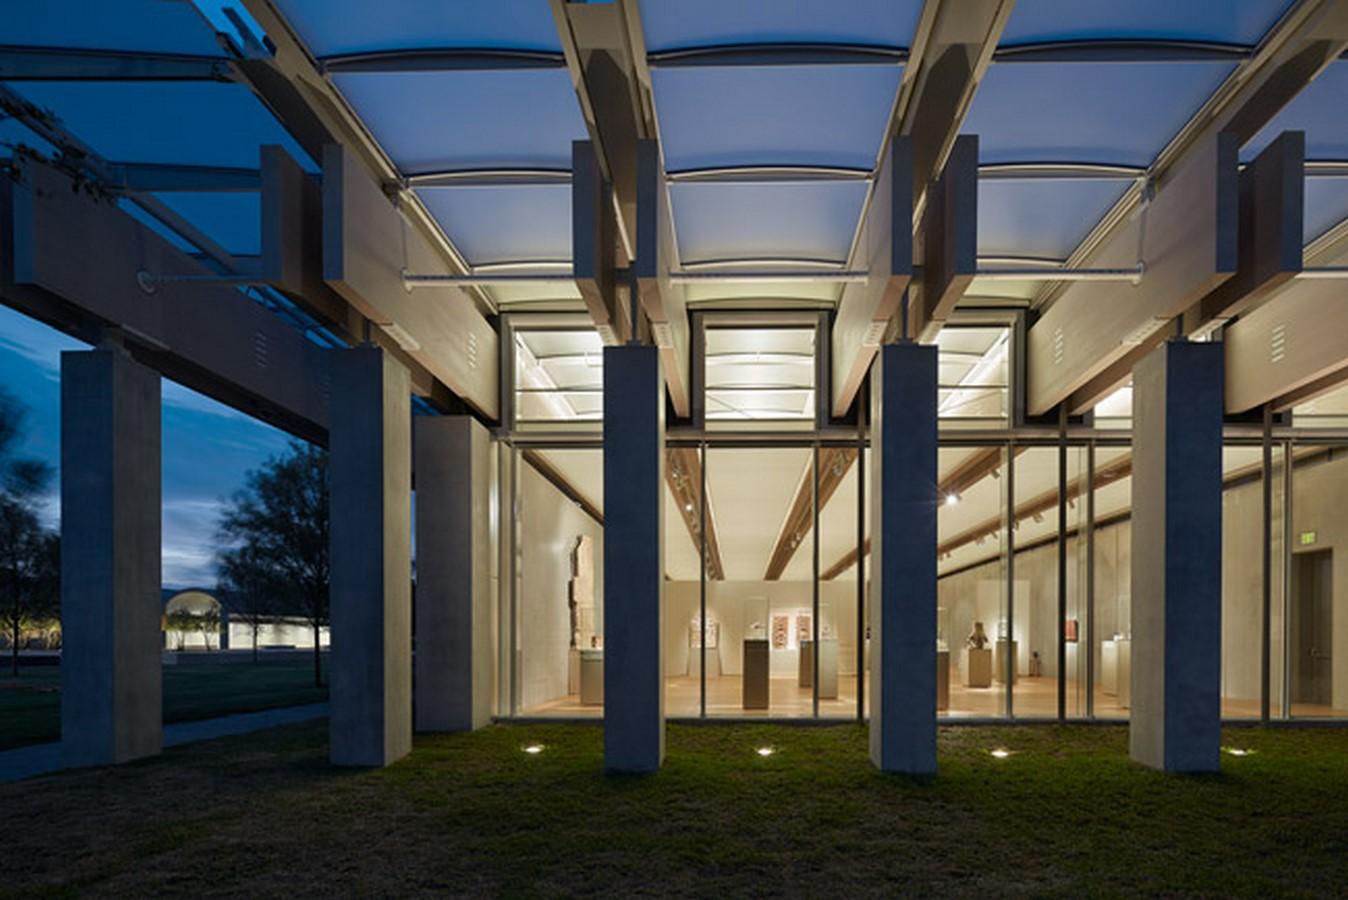 Kimbell Art Museum by Renzo Piano: Mecca of modern architecture - Sheet15